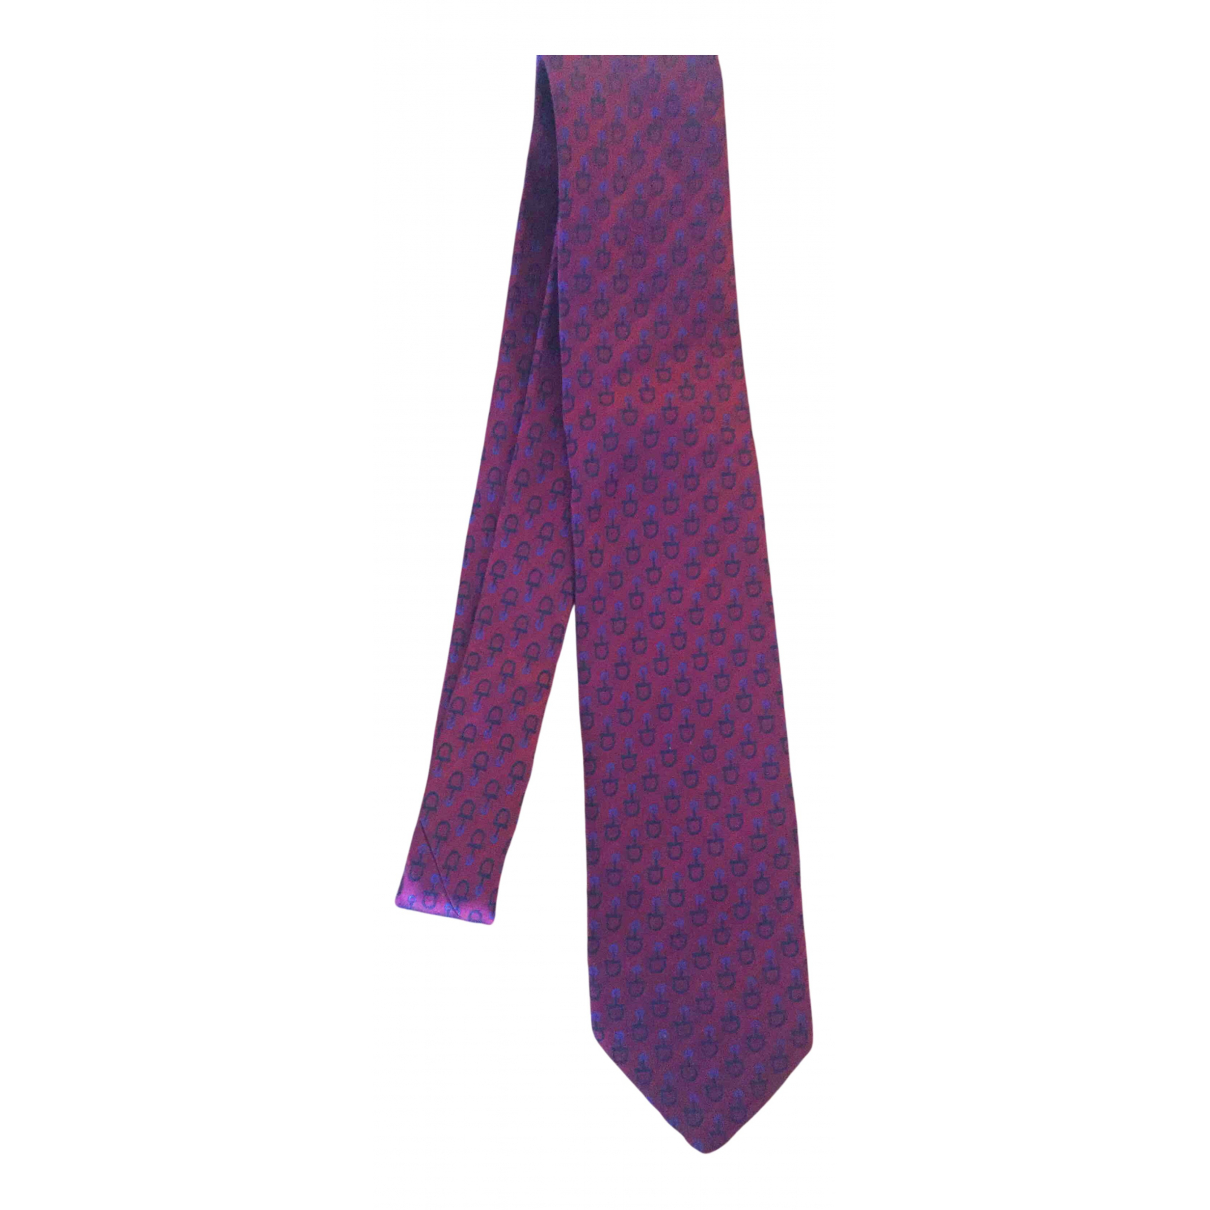 Gucci N Multicolour Silk Ties for Men N